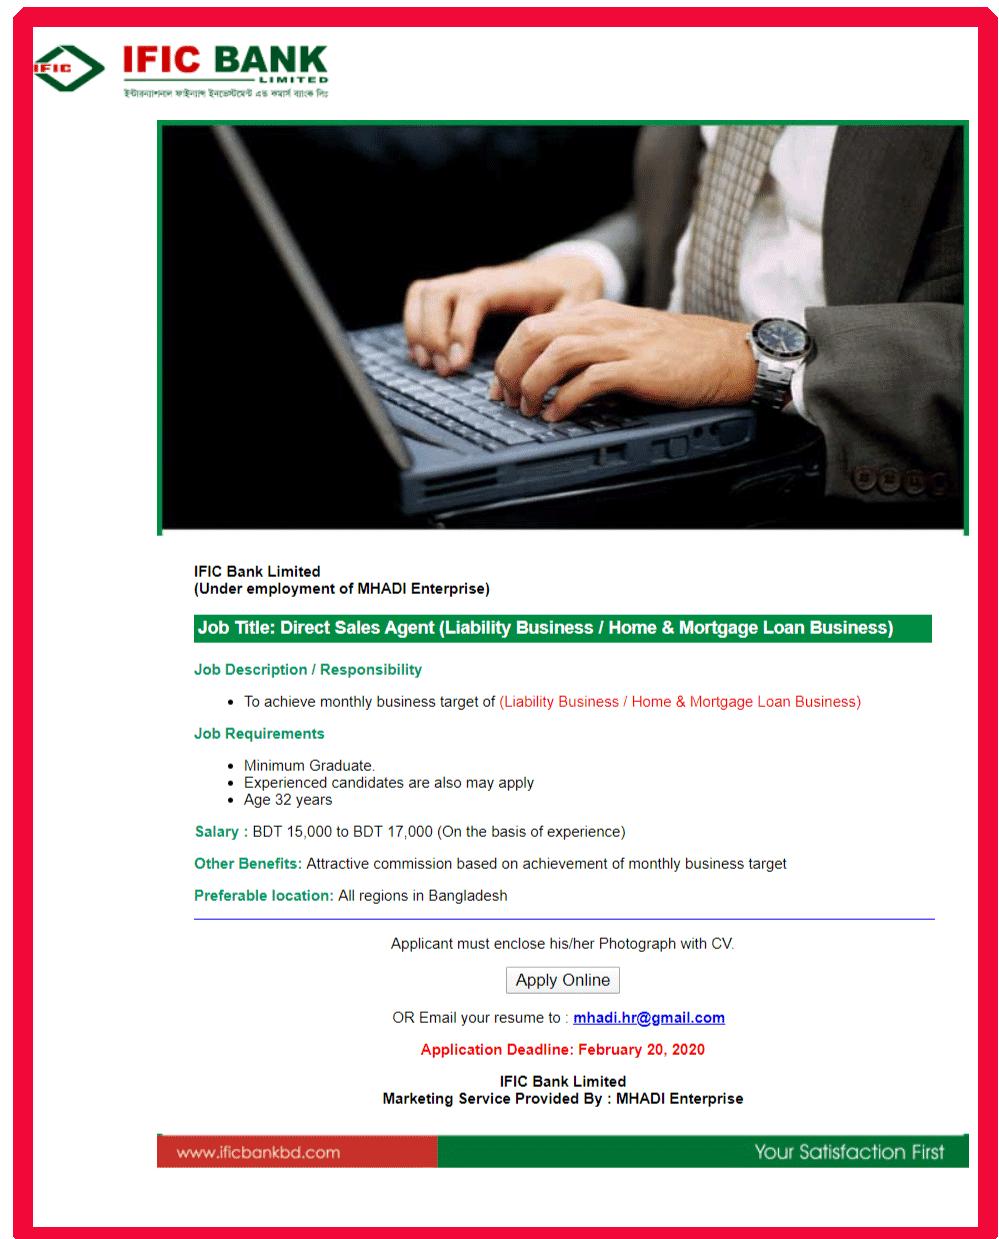 IFIC Bank Ltd Job circular February 2020